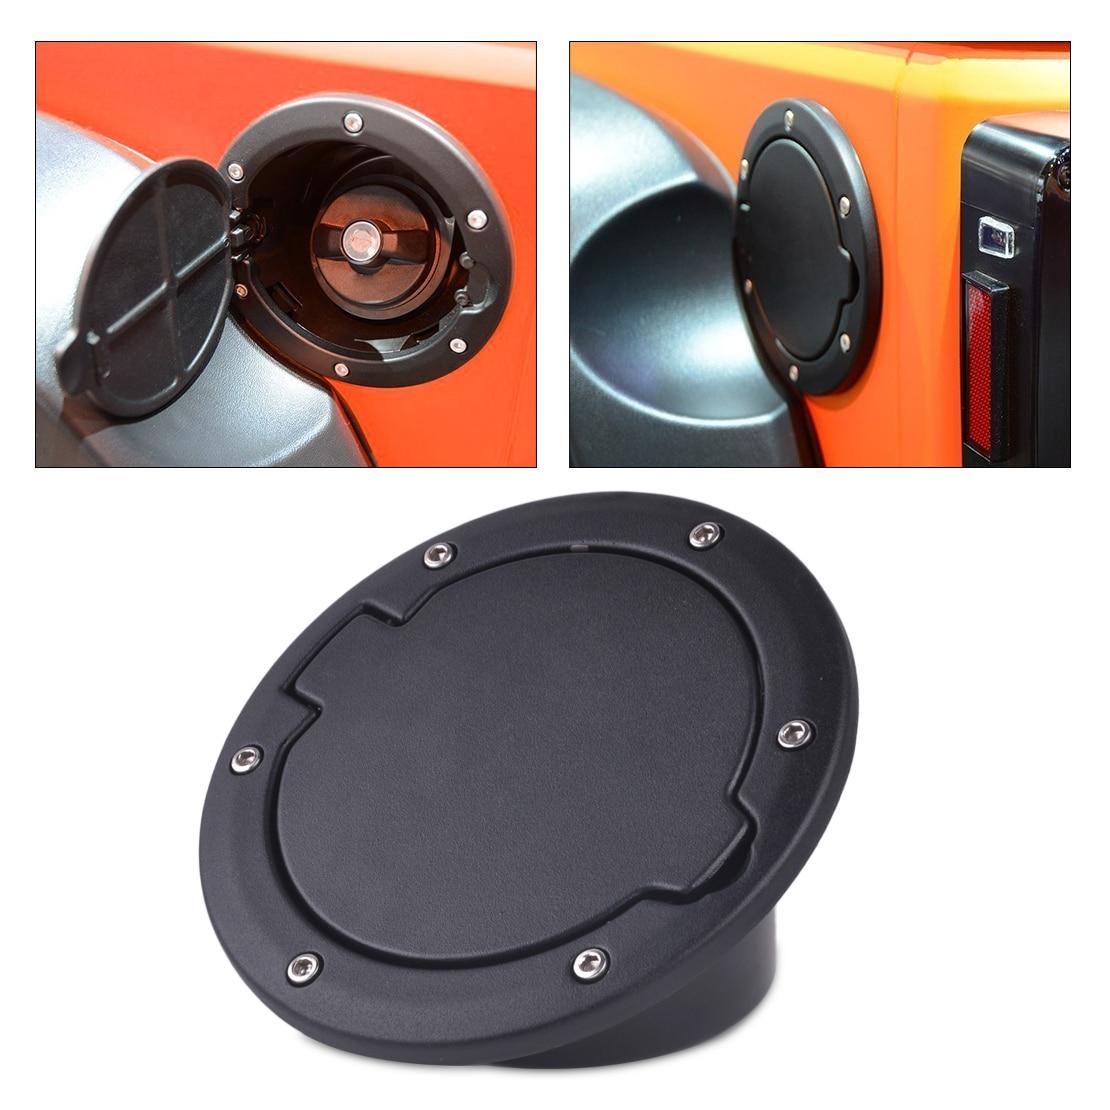 Dwcx car black fuel filler cover gas tank cap for jeep wrangler jk rubicon sahara